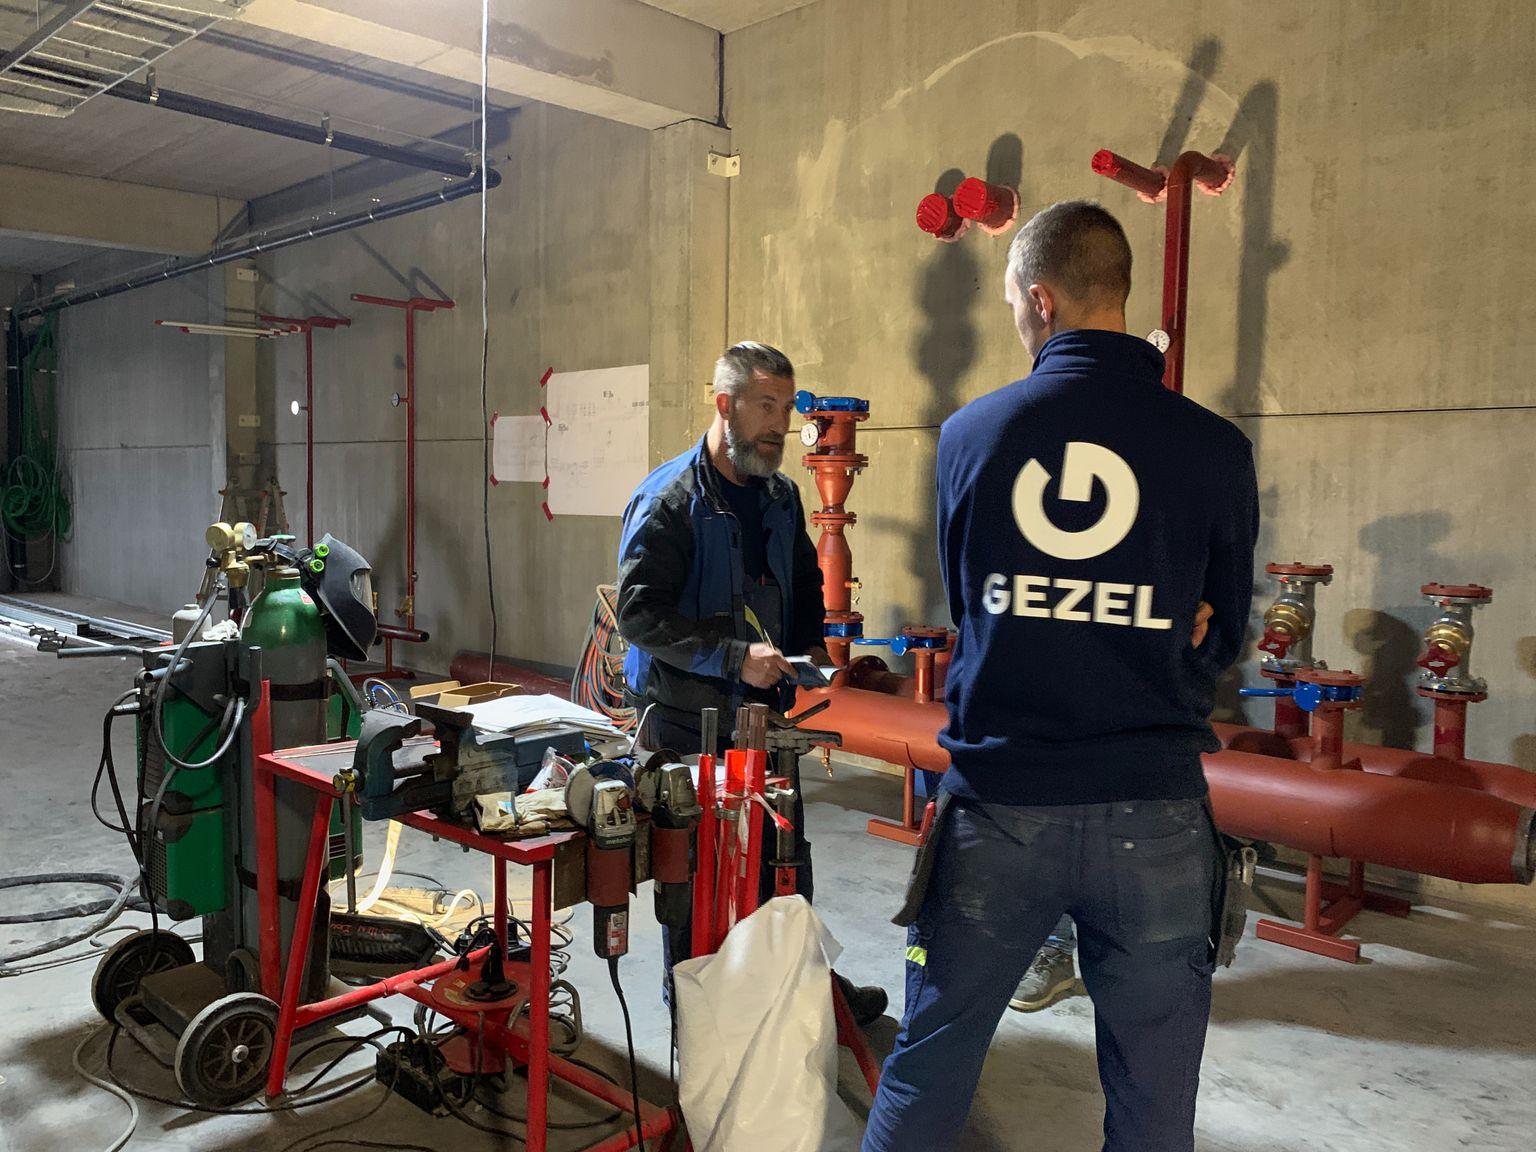 Gezel HVAC-specialist